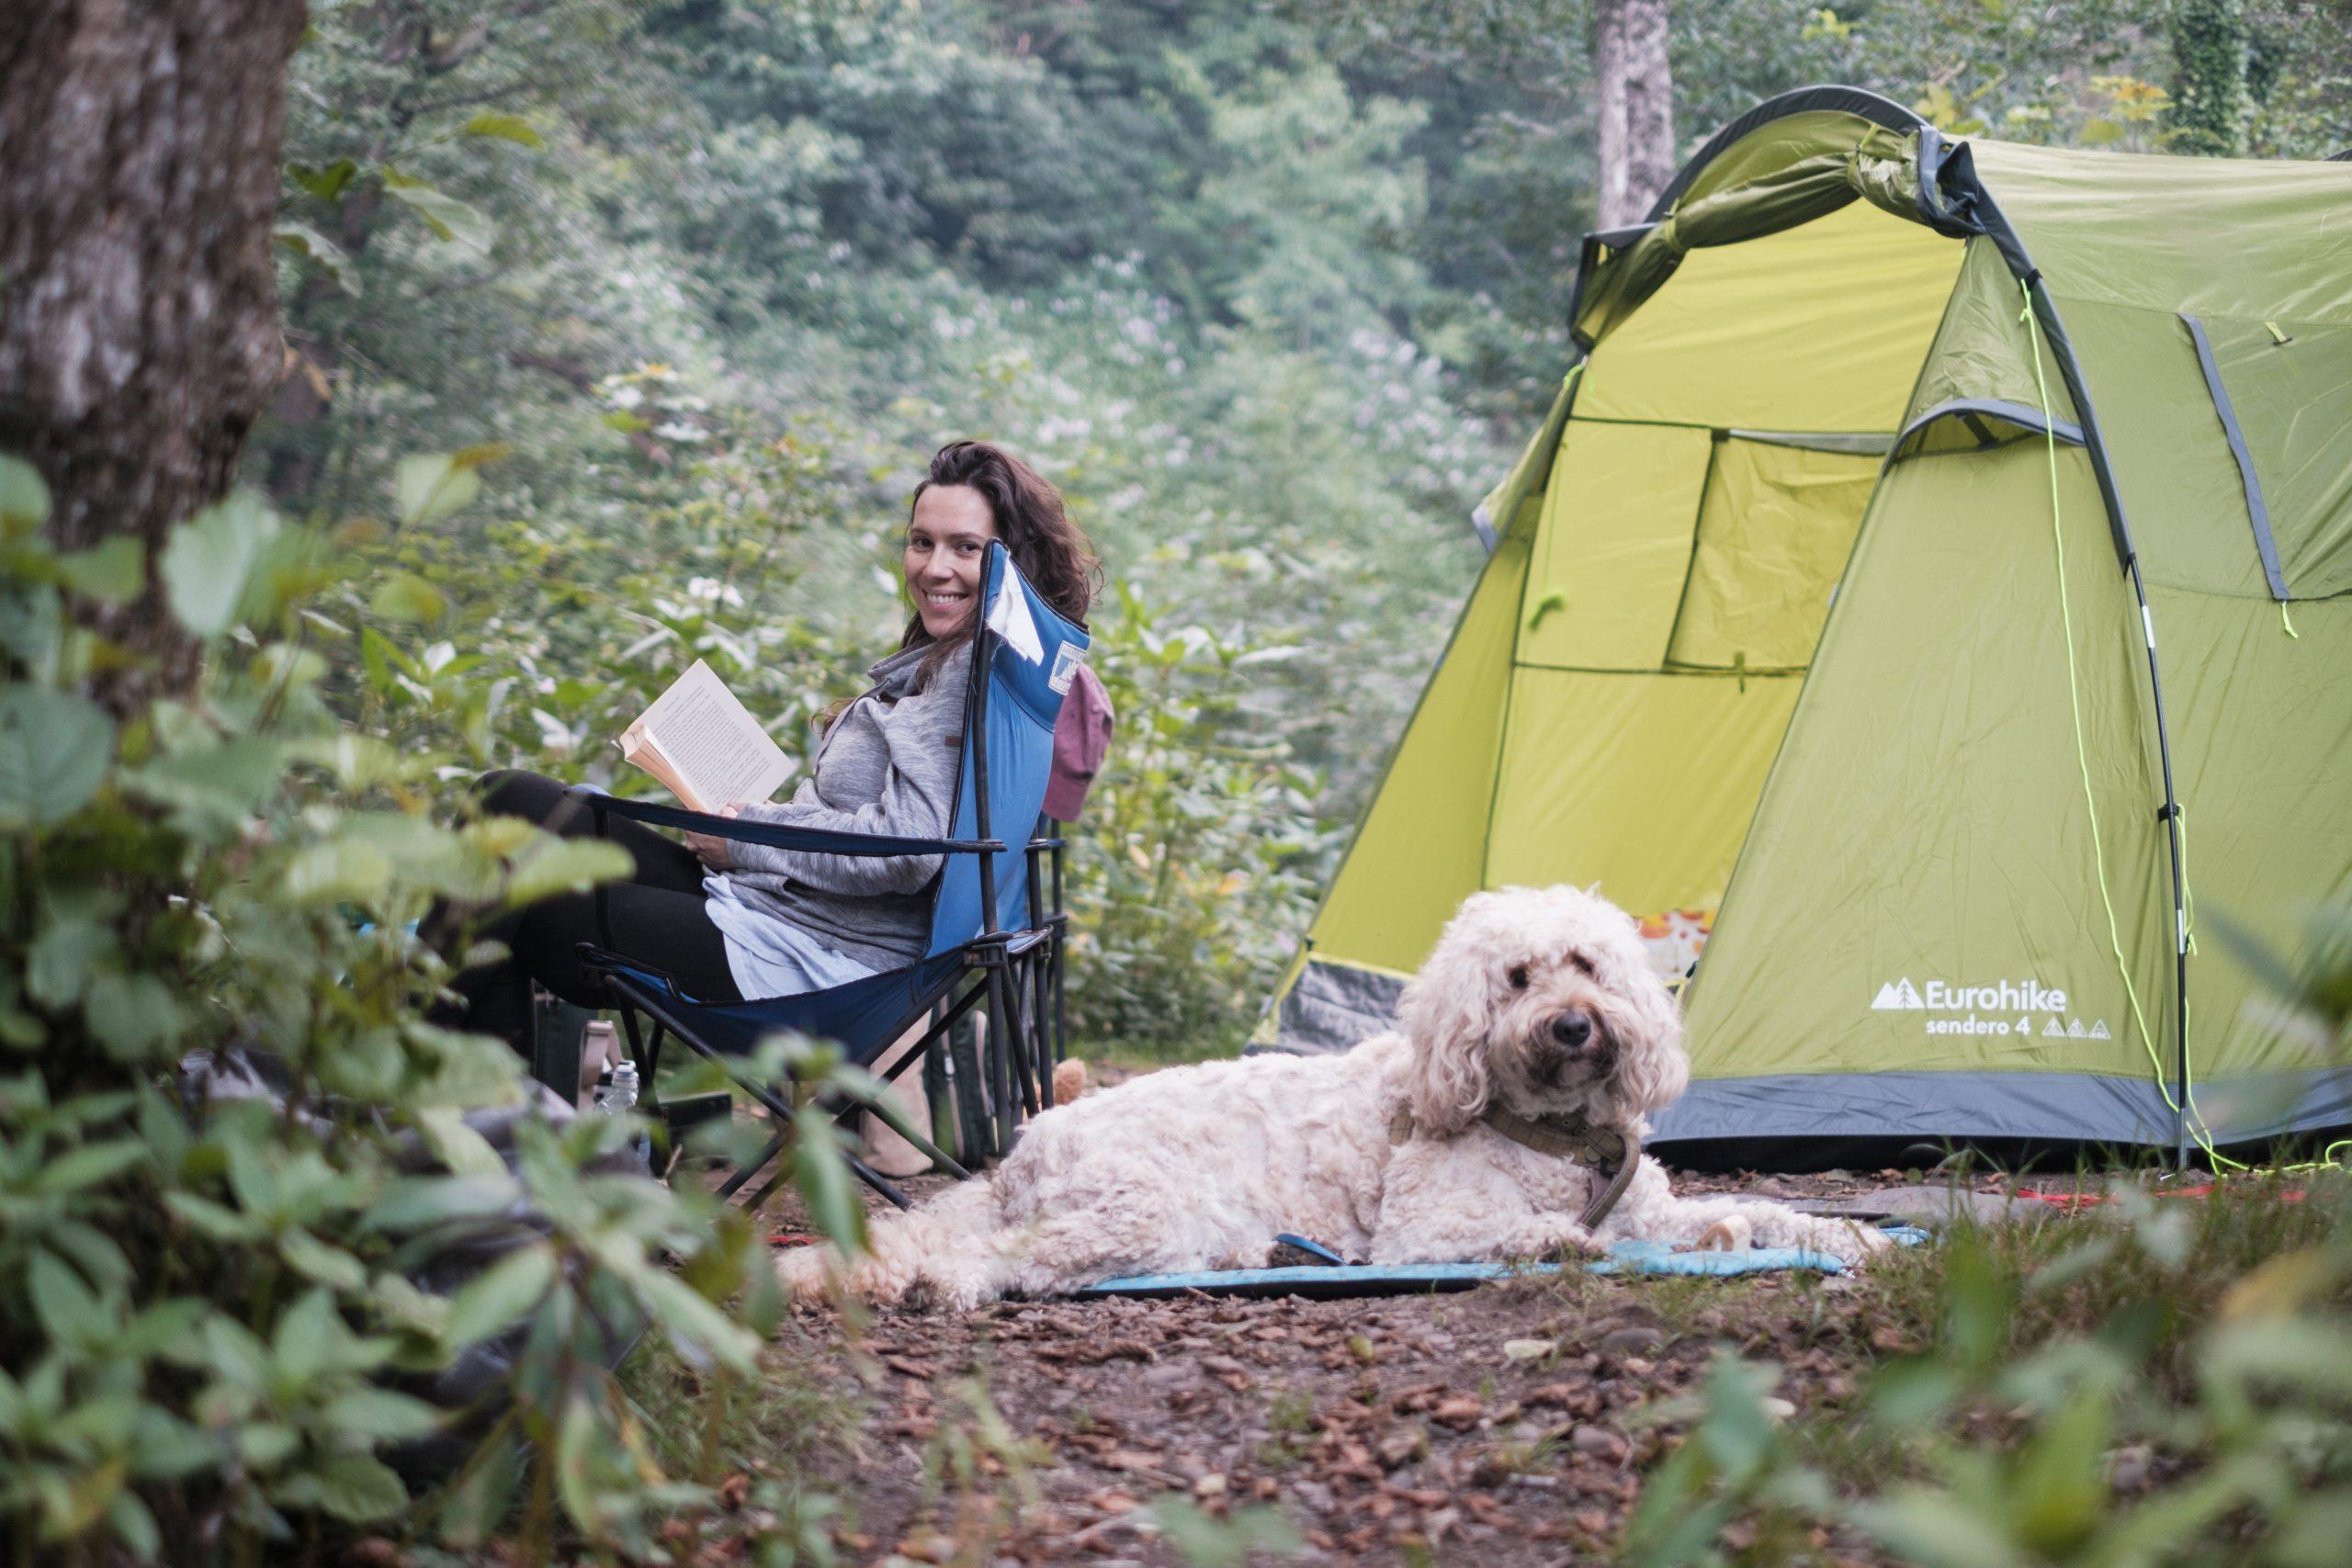 Wild Camping in Neath, Wales, UK - Ben Holbrook DriftwoodJournals.com-19